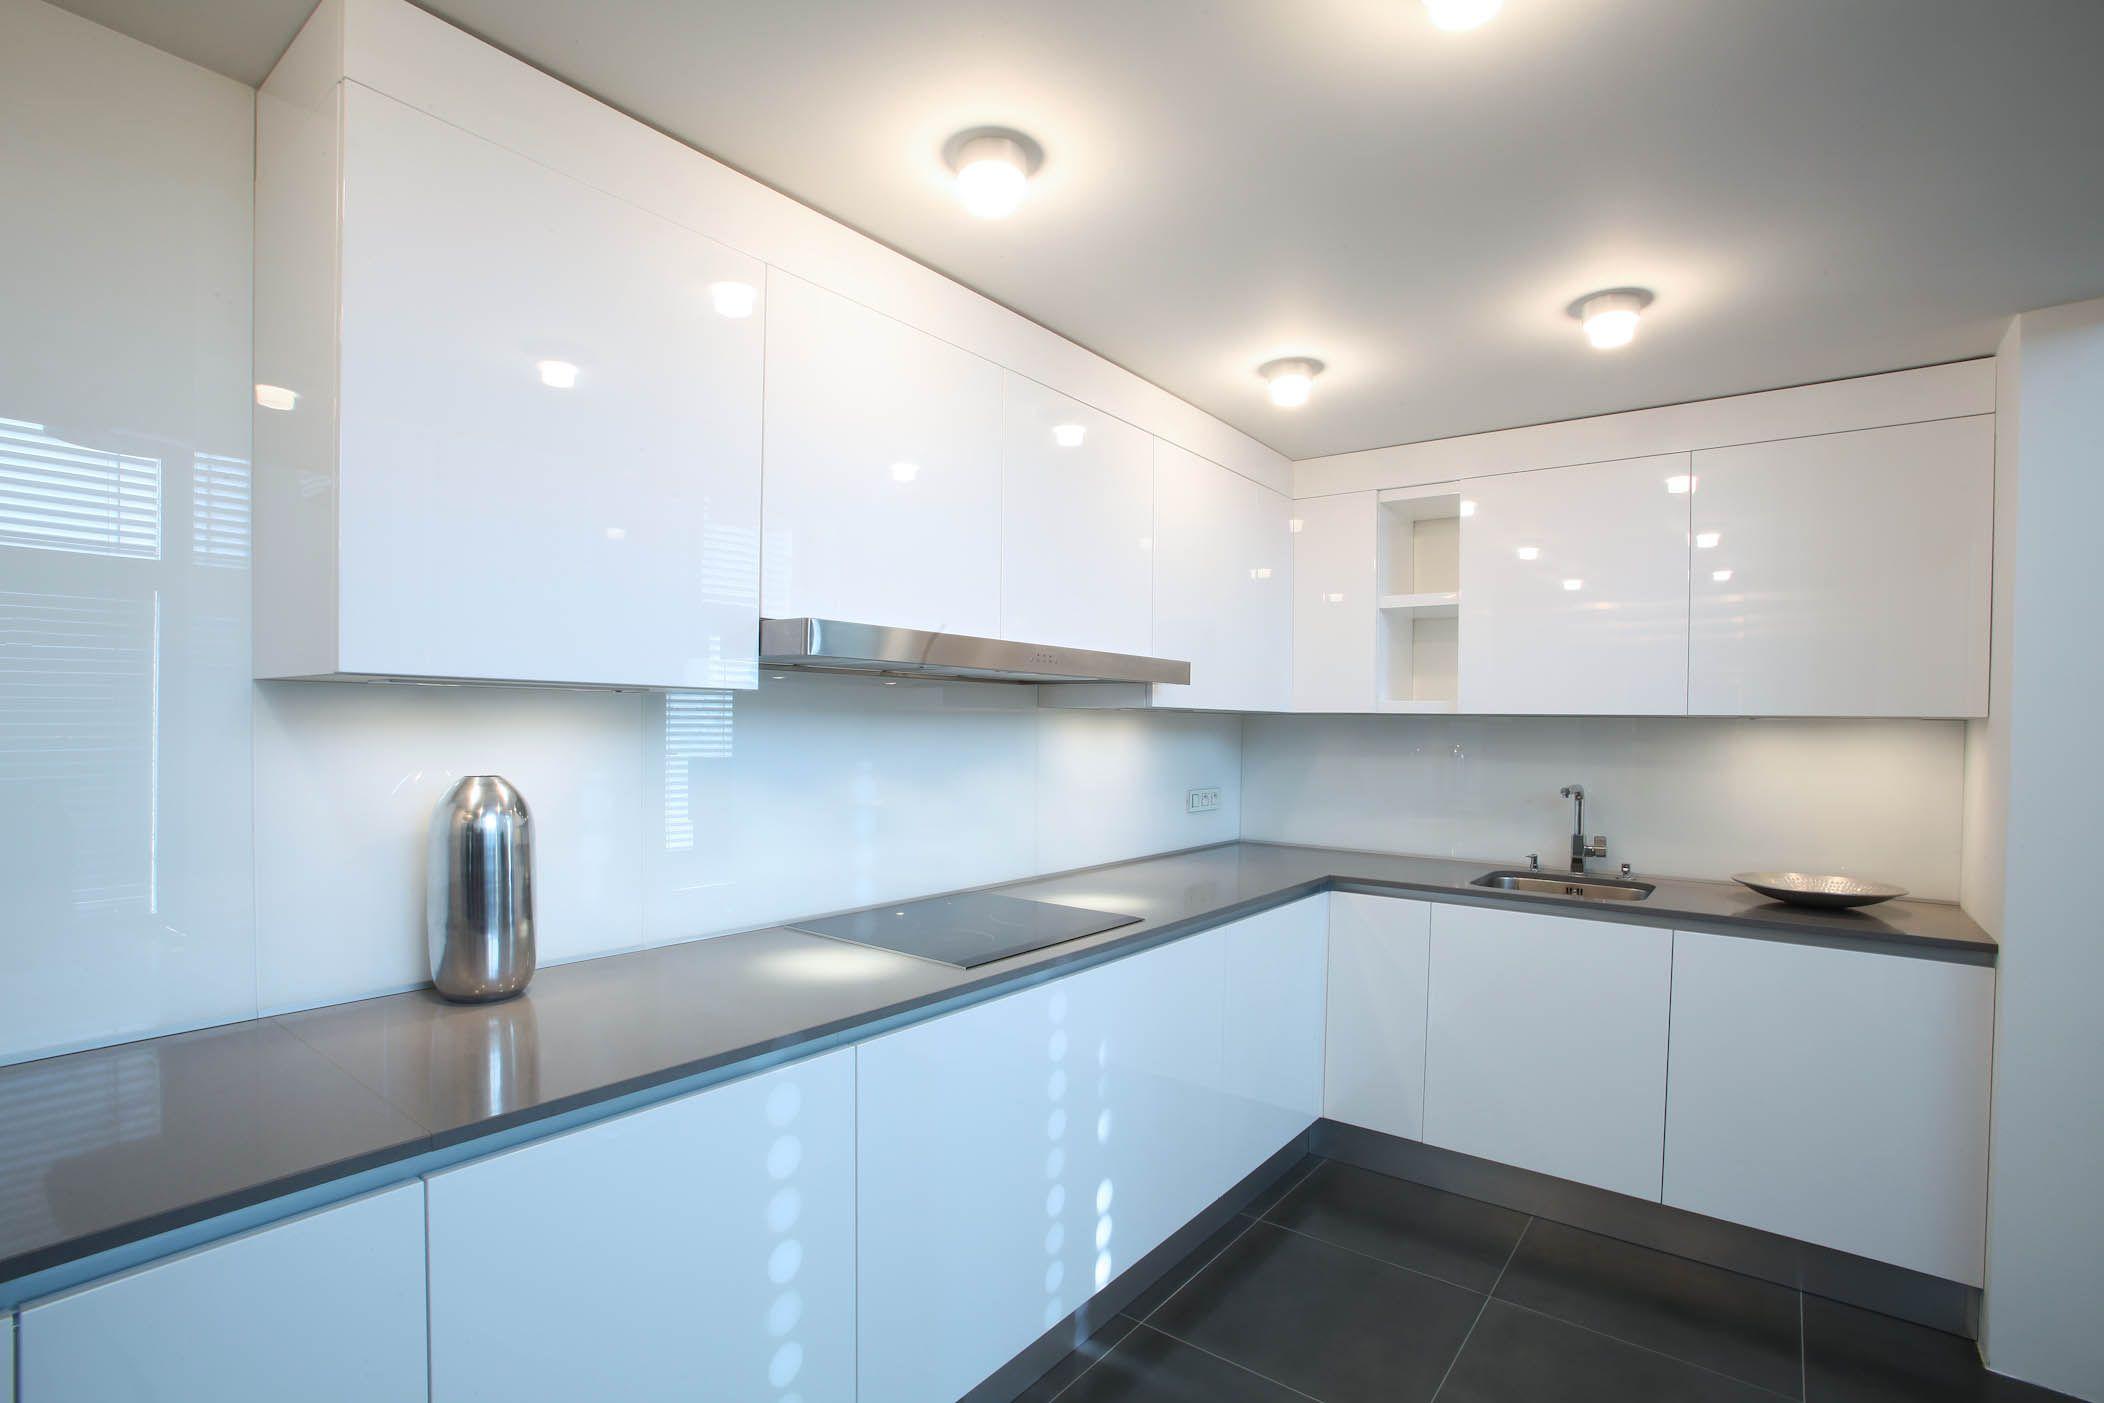 White, minimalistic, clean kitchen, beautiful lighting, kitchen ...